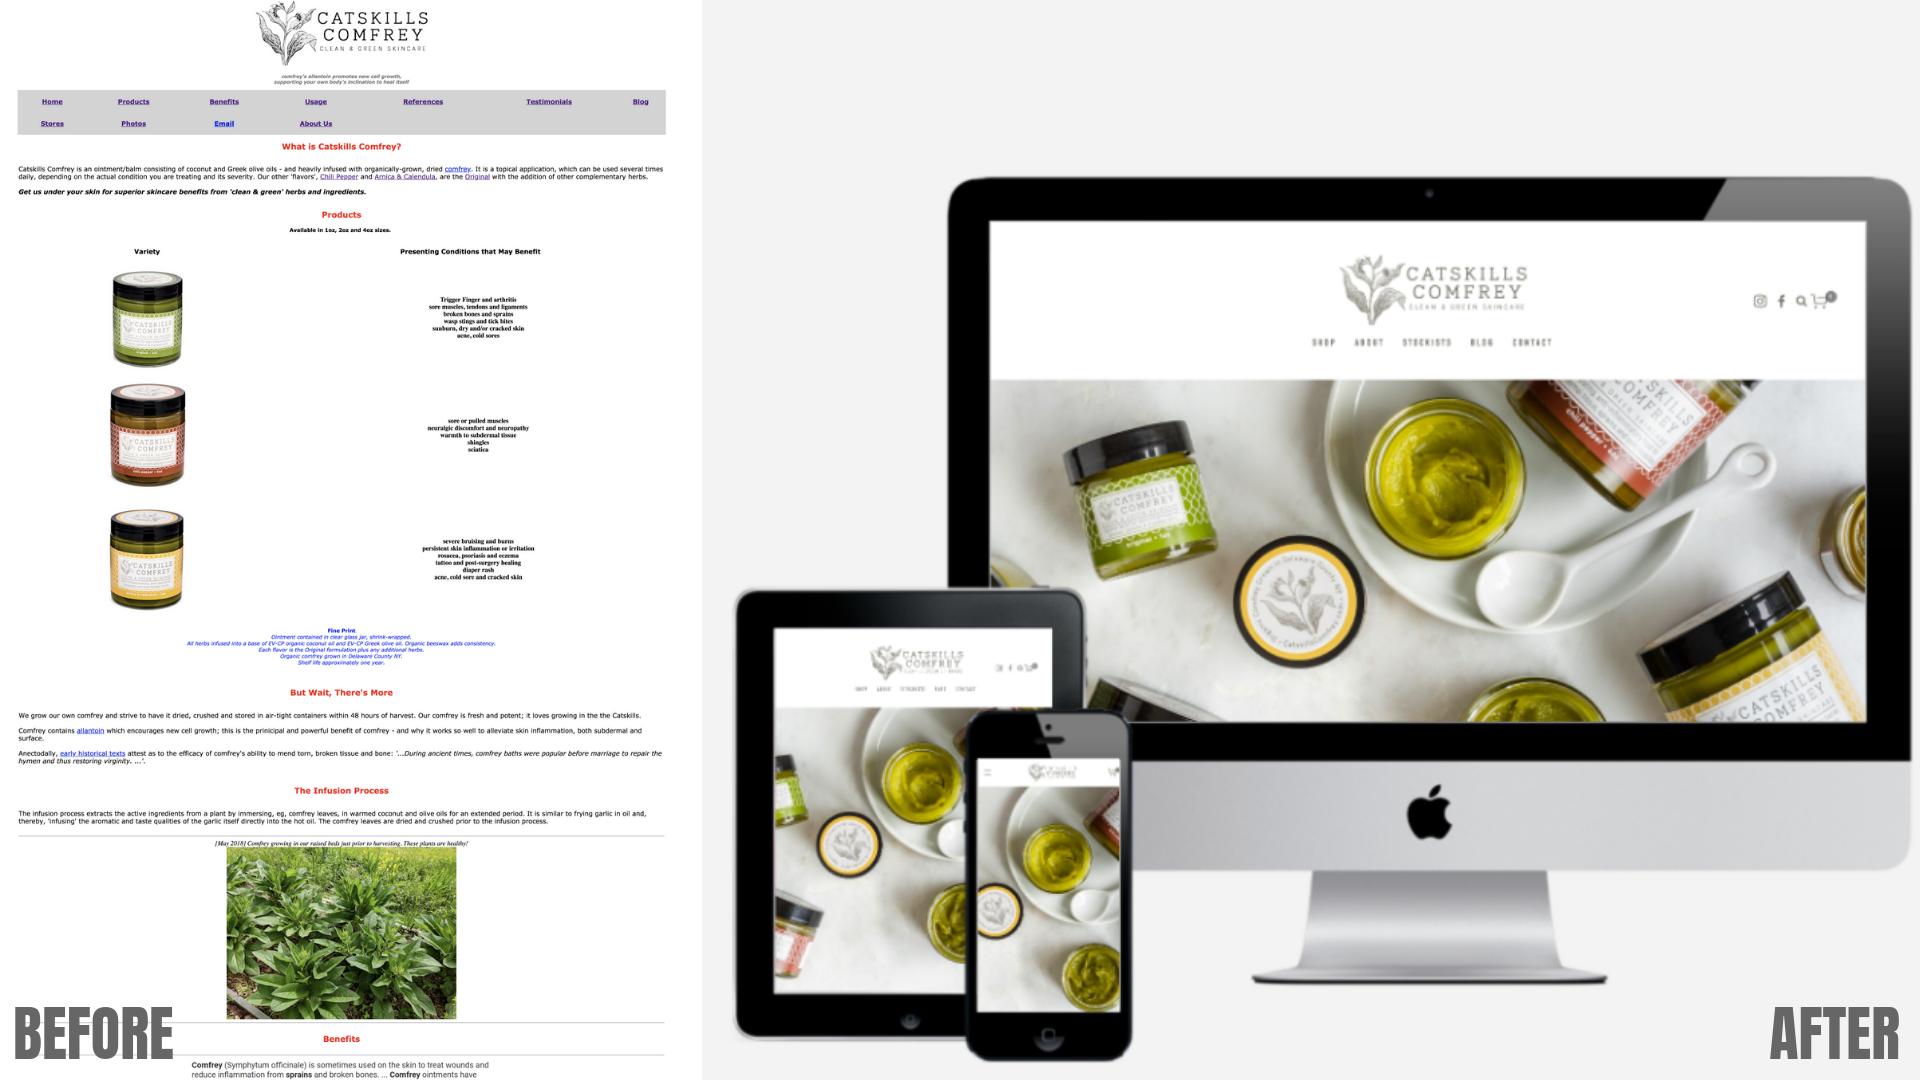 Catskills Comfrey   - new logo, product labels, e-commerce website.